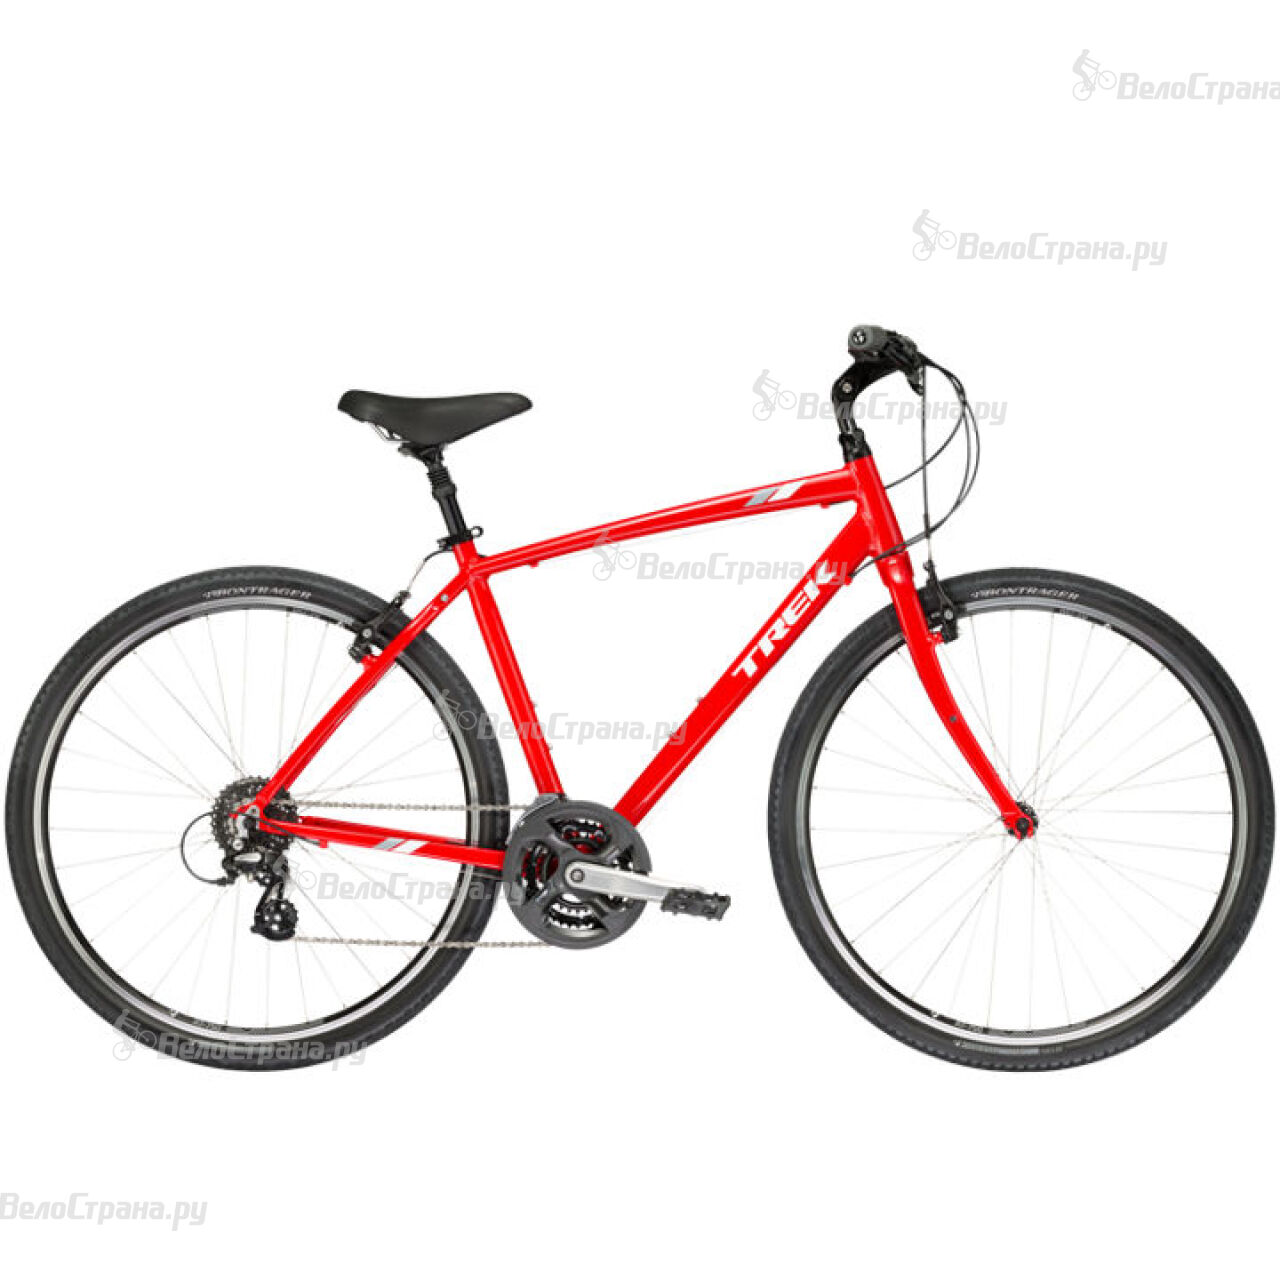 Велосипед Trek Verve 2 (2017) велосипед trek verve 2 2014